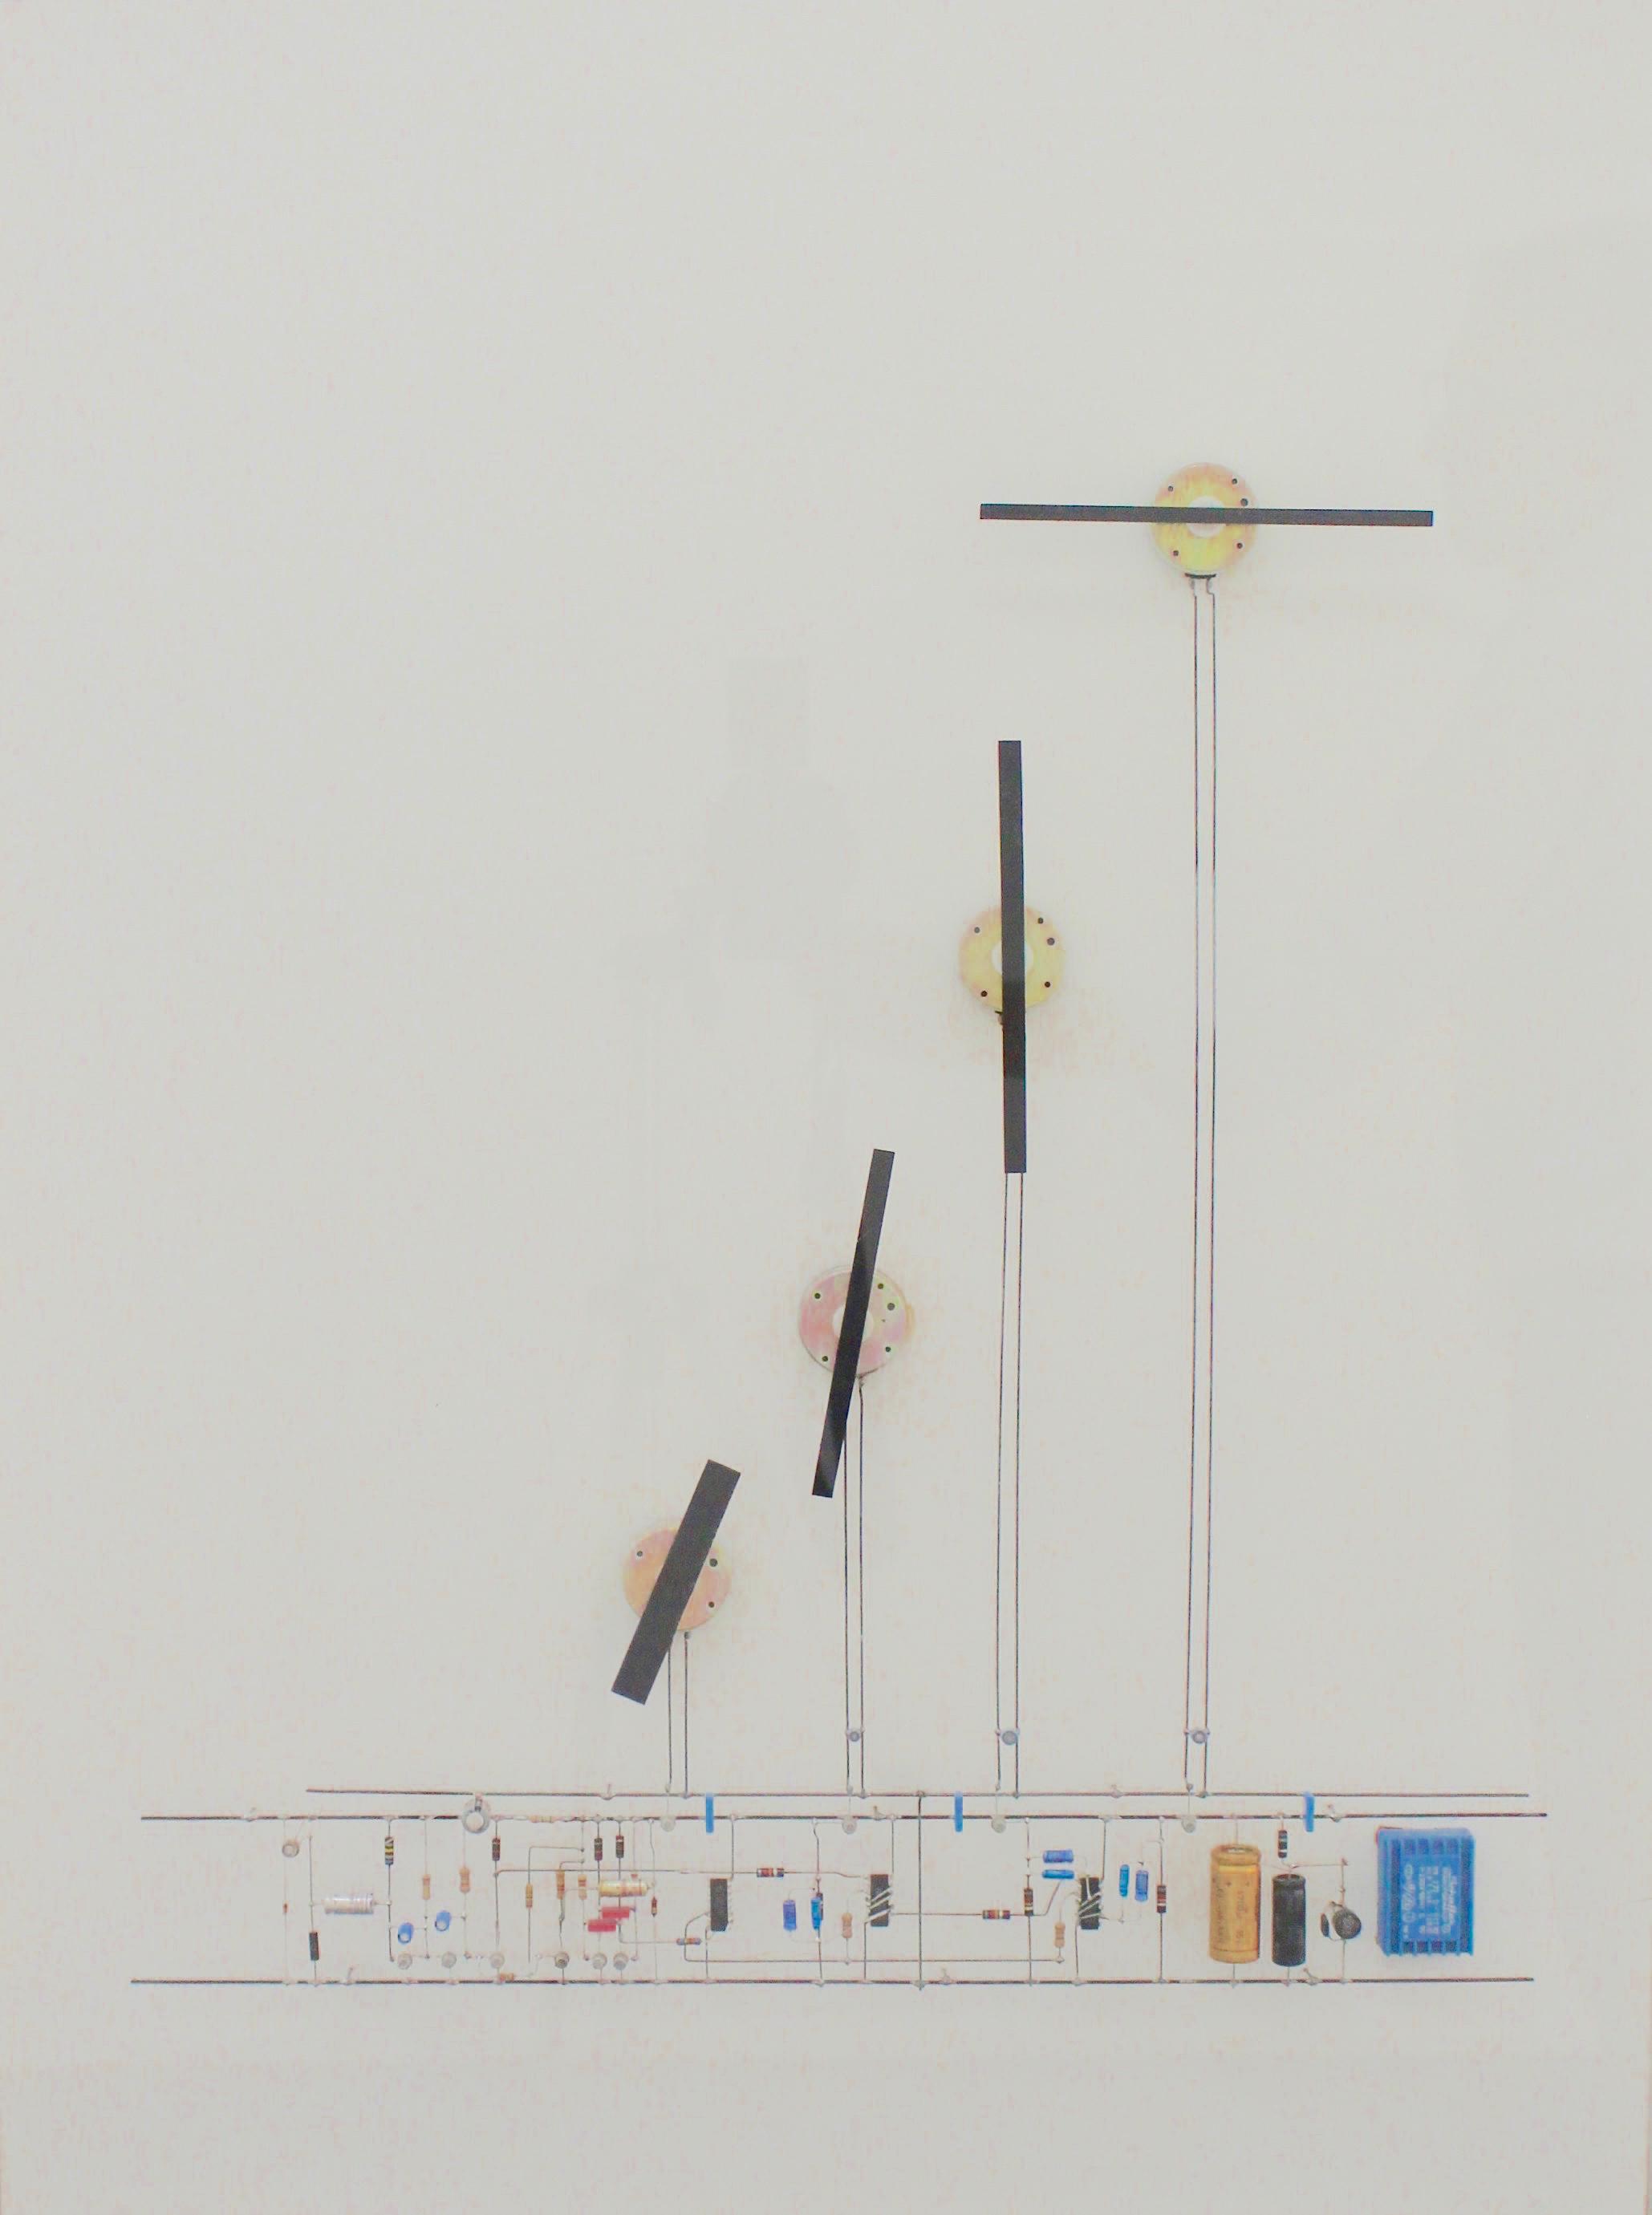 Peter Vogel, Drehflügel, mixed Media (Bewegung), 61 x 80,5 x 10,5 cm, 1998